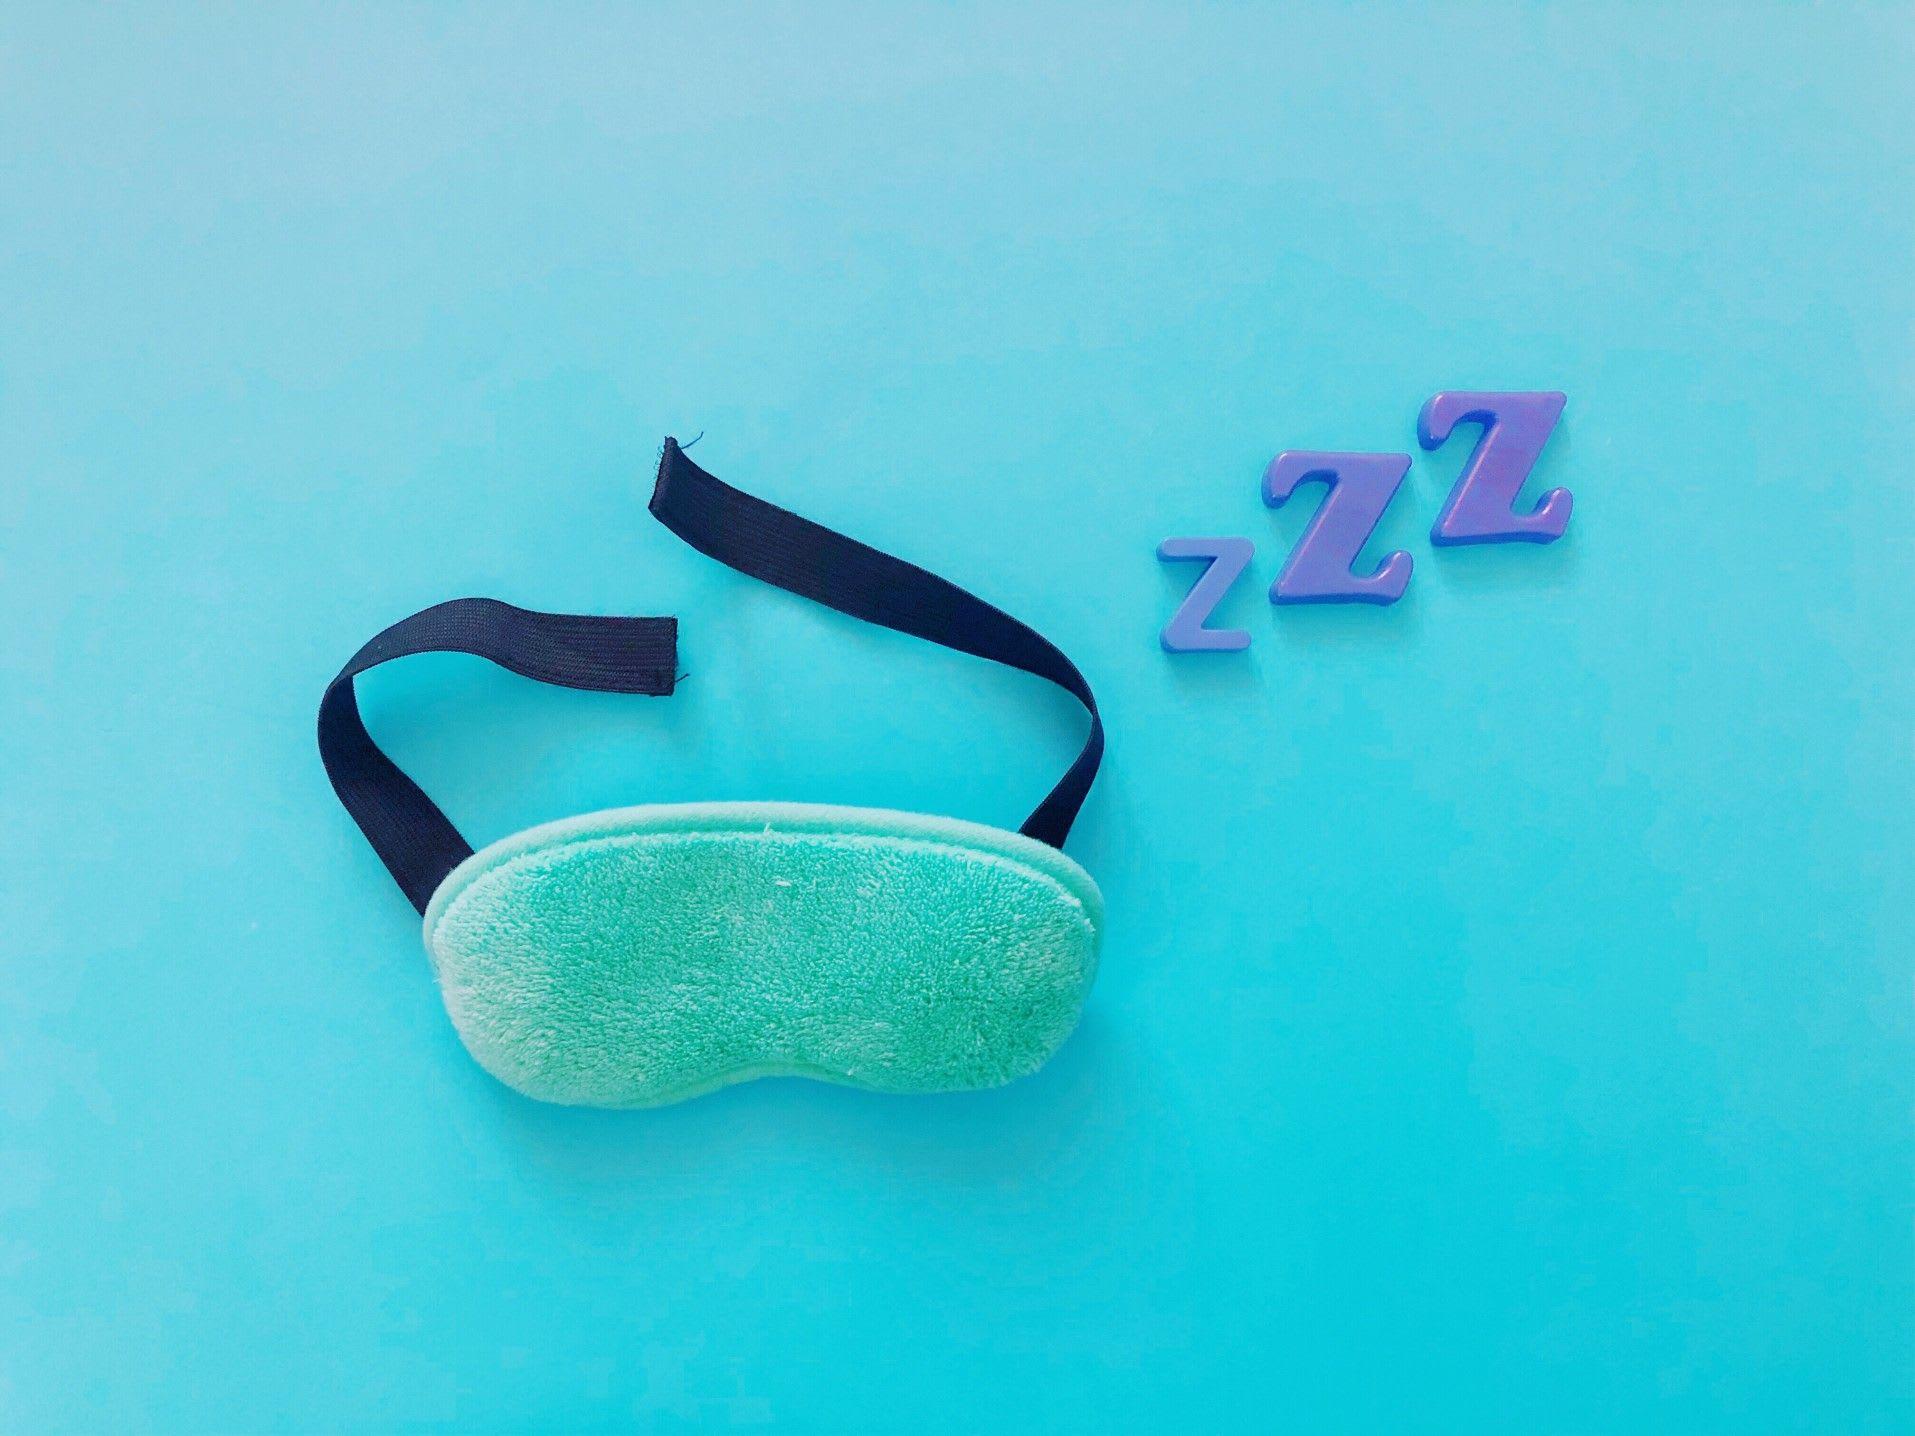 Secrets To Getting A Good Night's Sleep